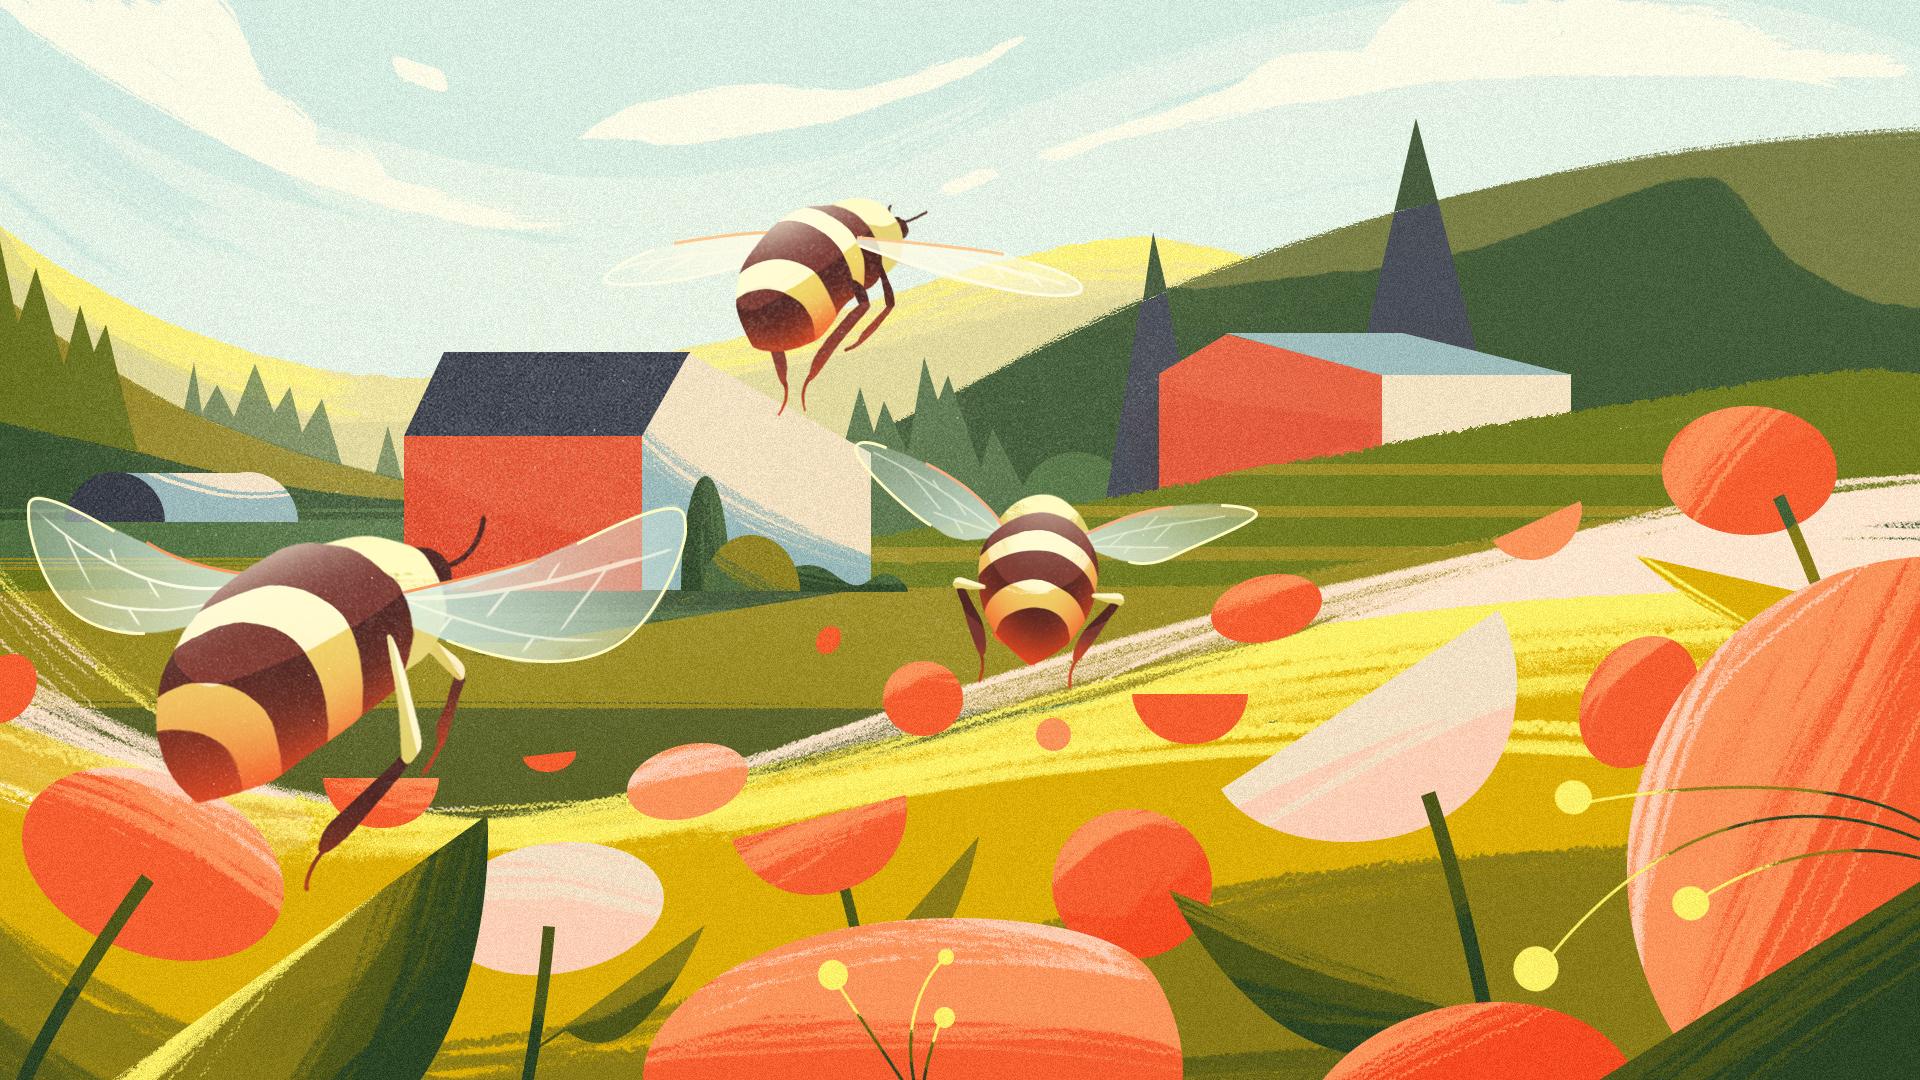 Bees_B_030419.jpg